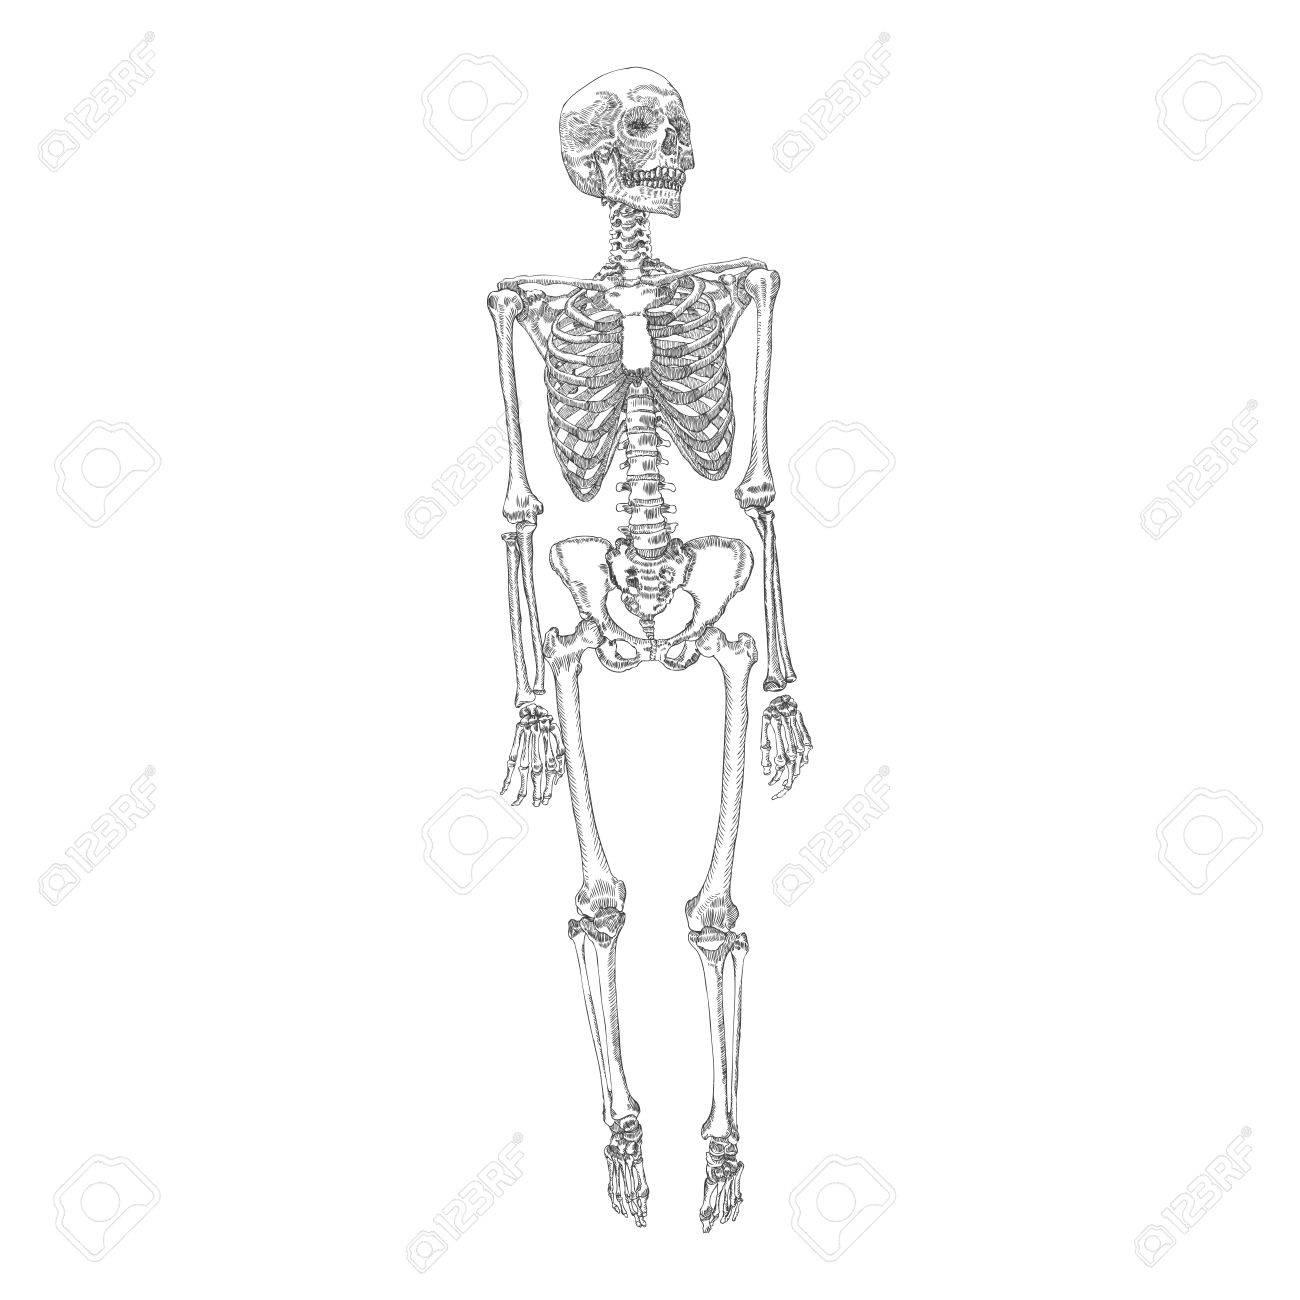 Esqueleto De Huesos Humanos De Pie Dibujo. Con Brazos, Piernas ...